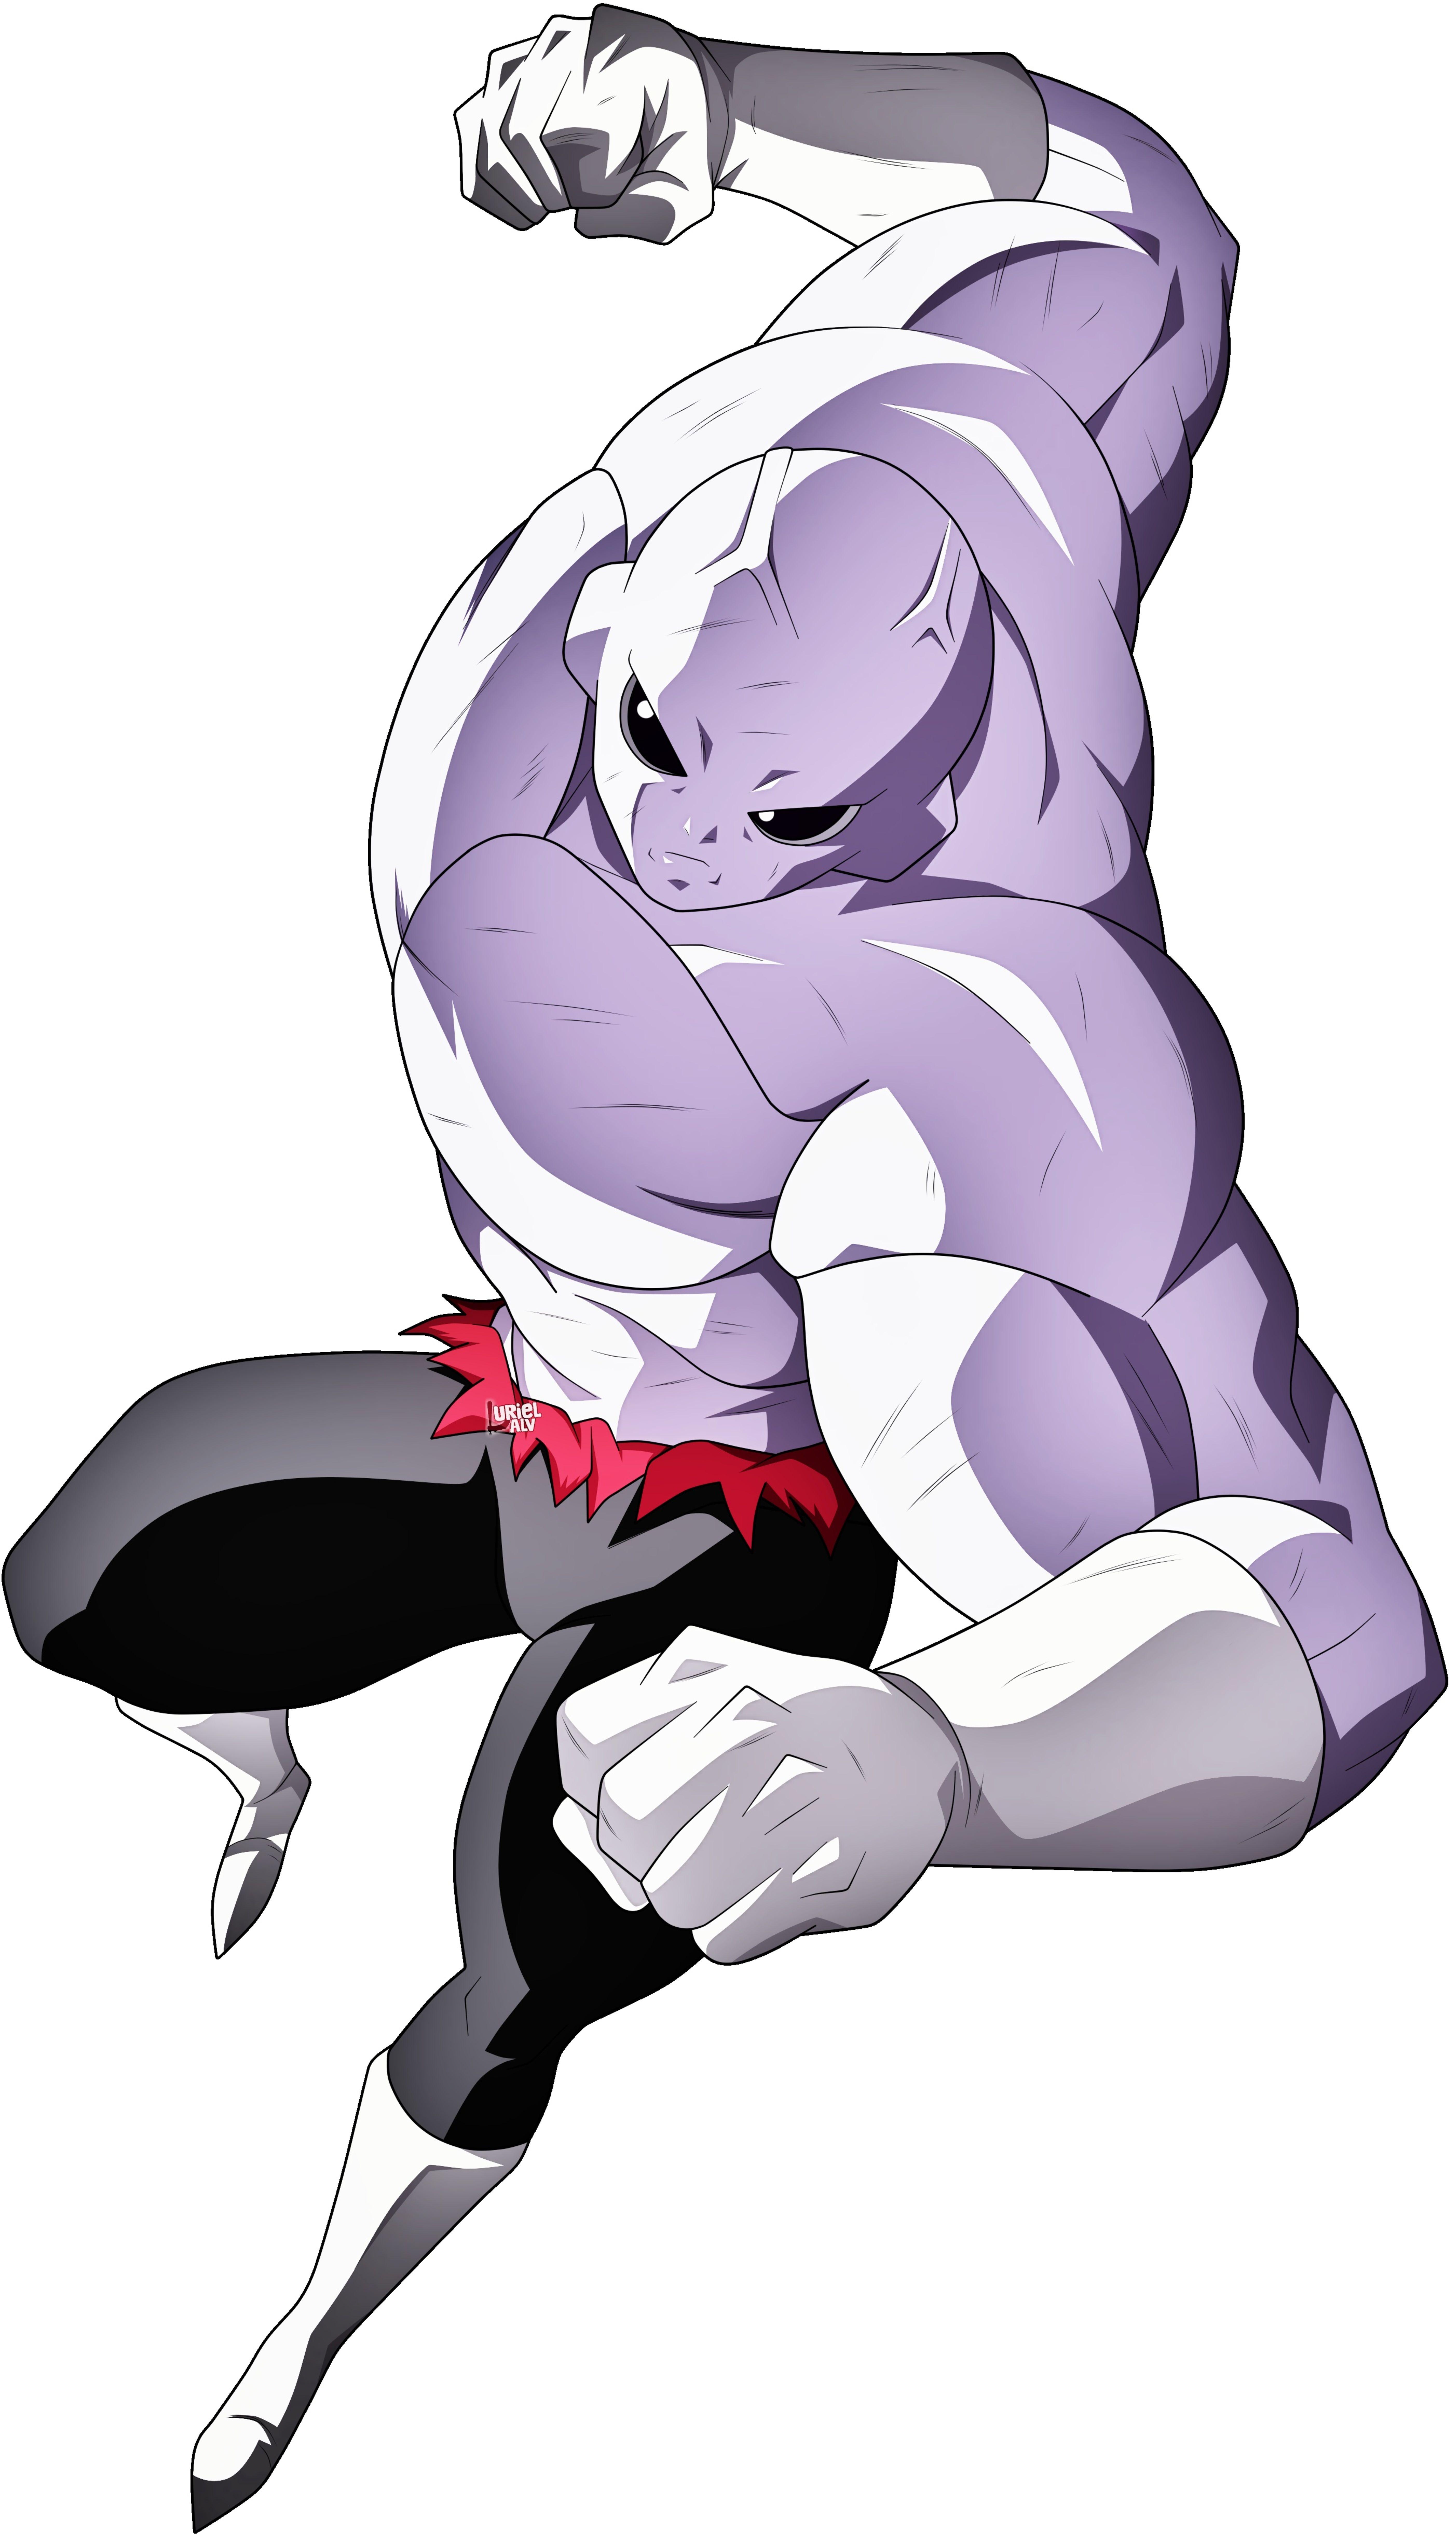 Jiren Full Power Universo 11 Personajes De Goku Dragones Dibujo De Goku